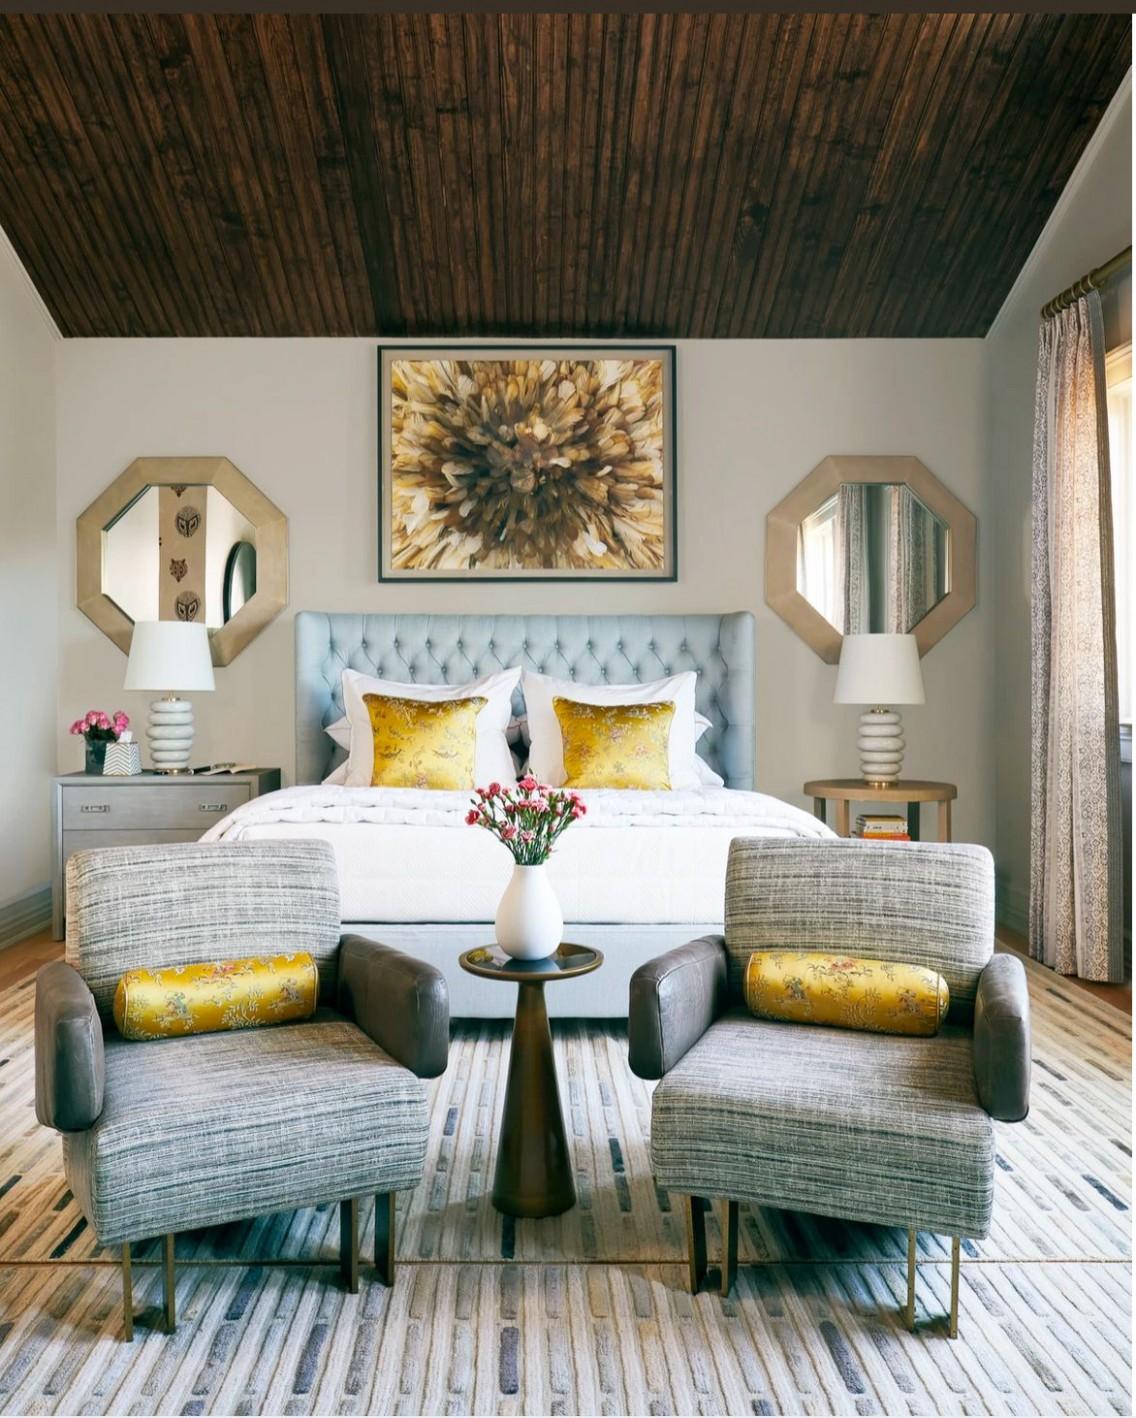 11 Stylish Bedroom Design Ideas - Modern Bedrooms Decorating Tips - Bedroom Ideas Design